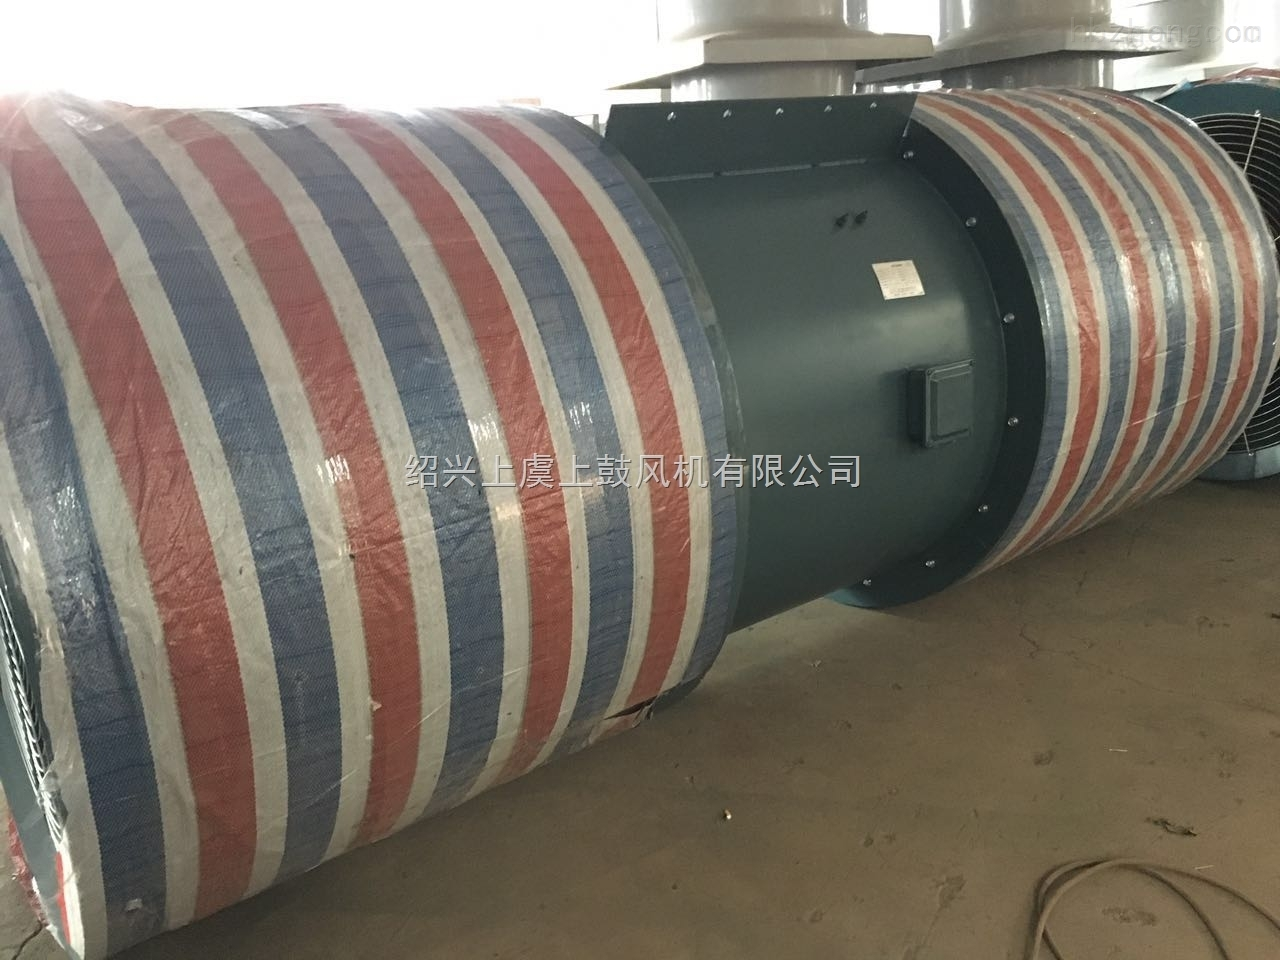 SDS-7.1-2P-6-24° 單向雙向隧道射流風機